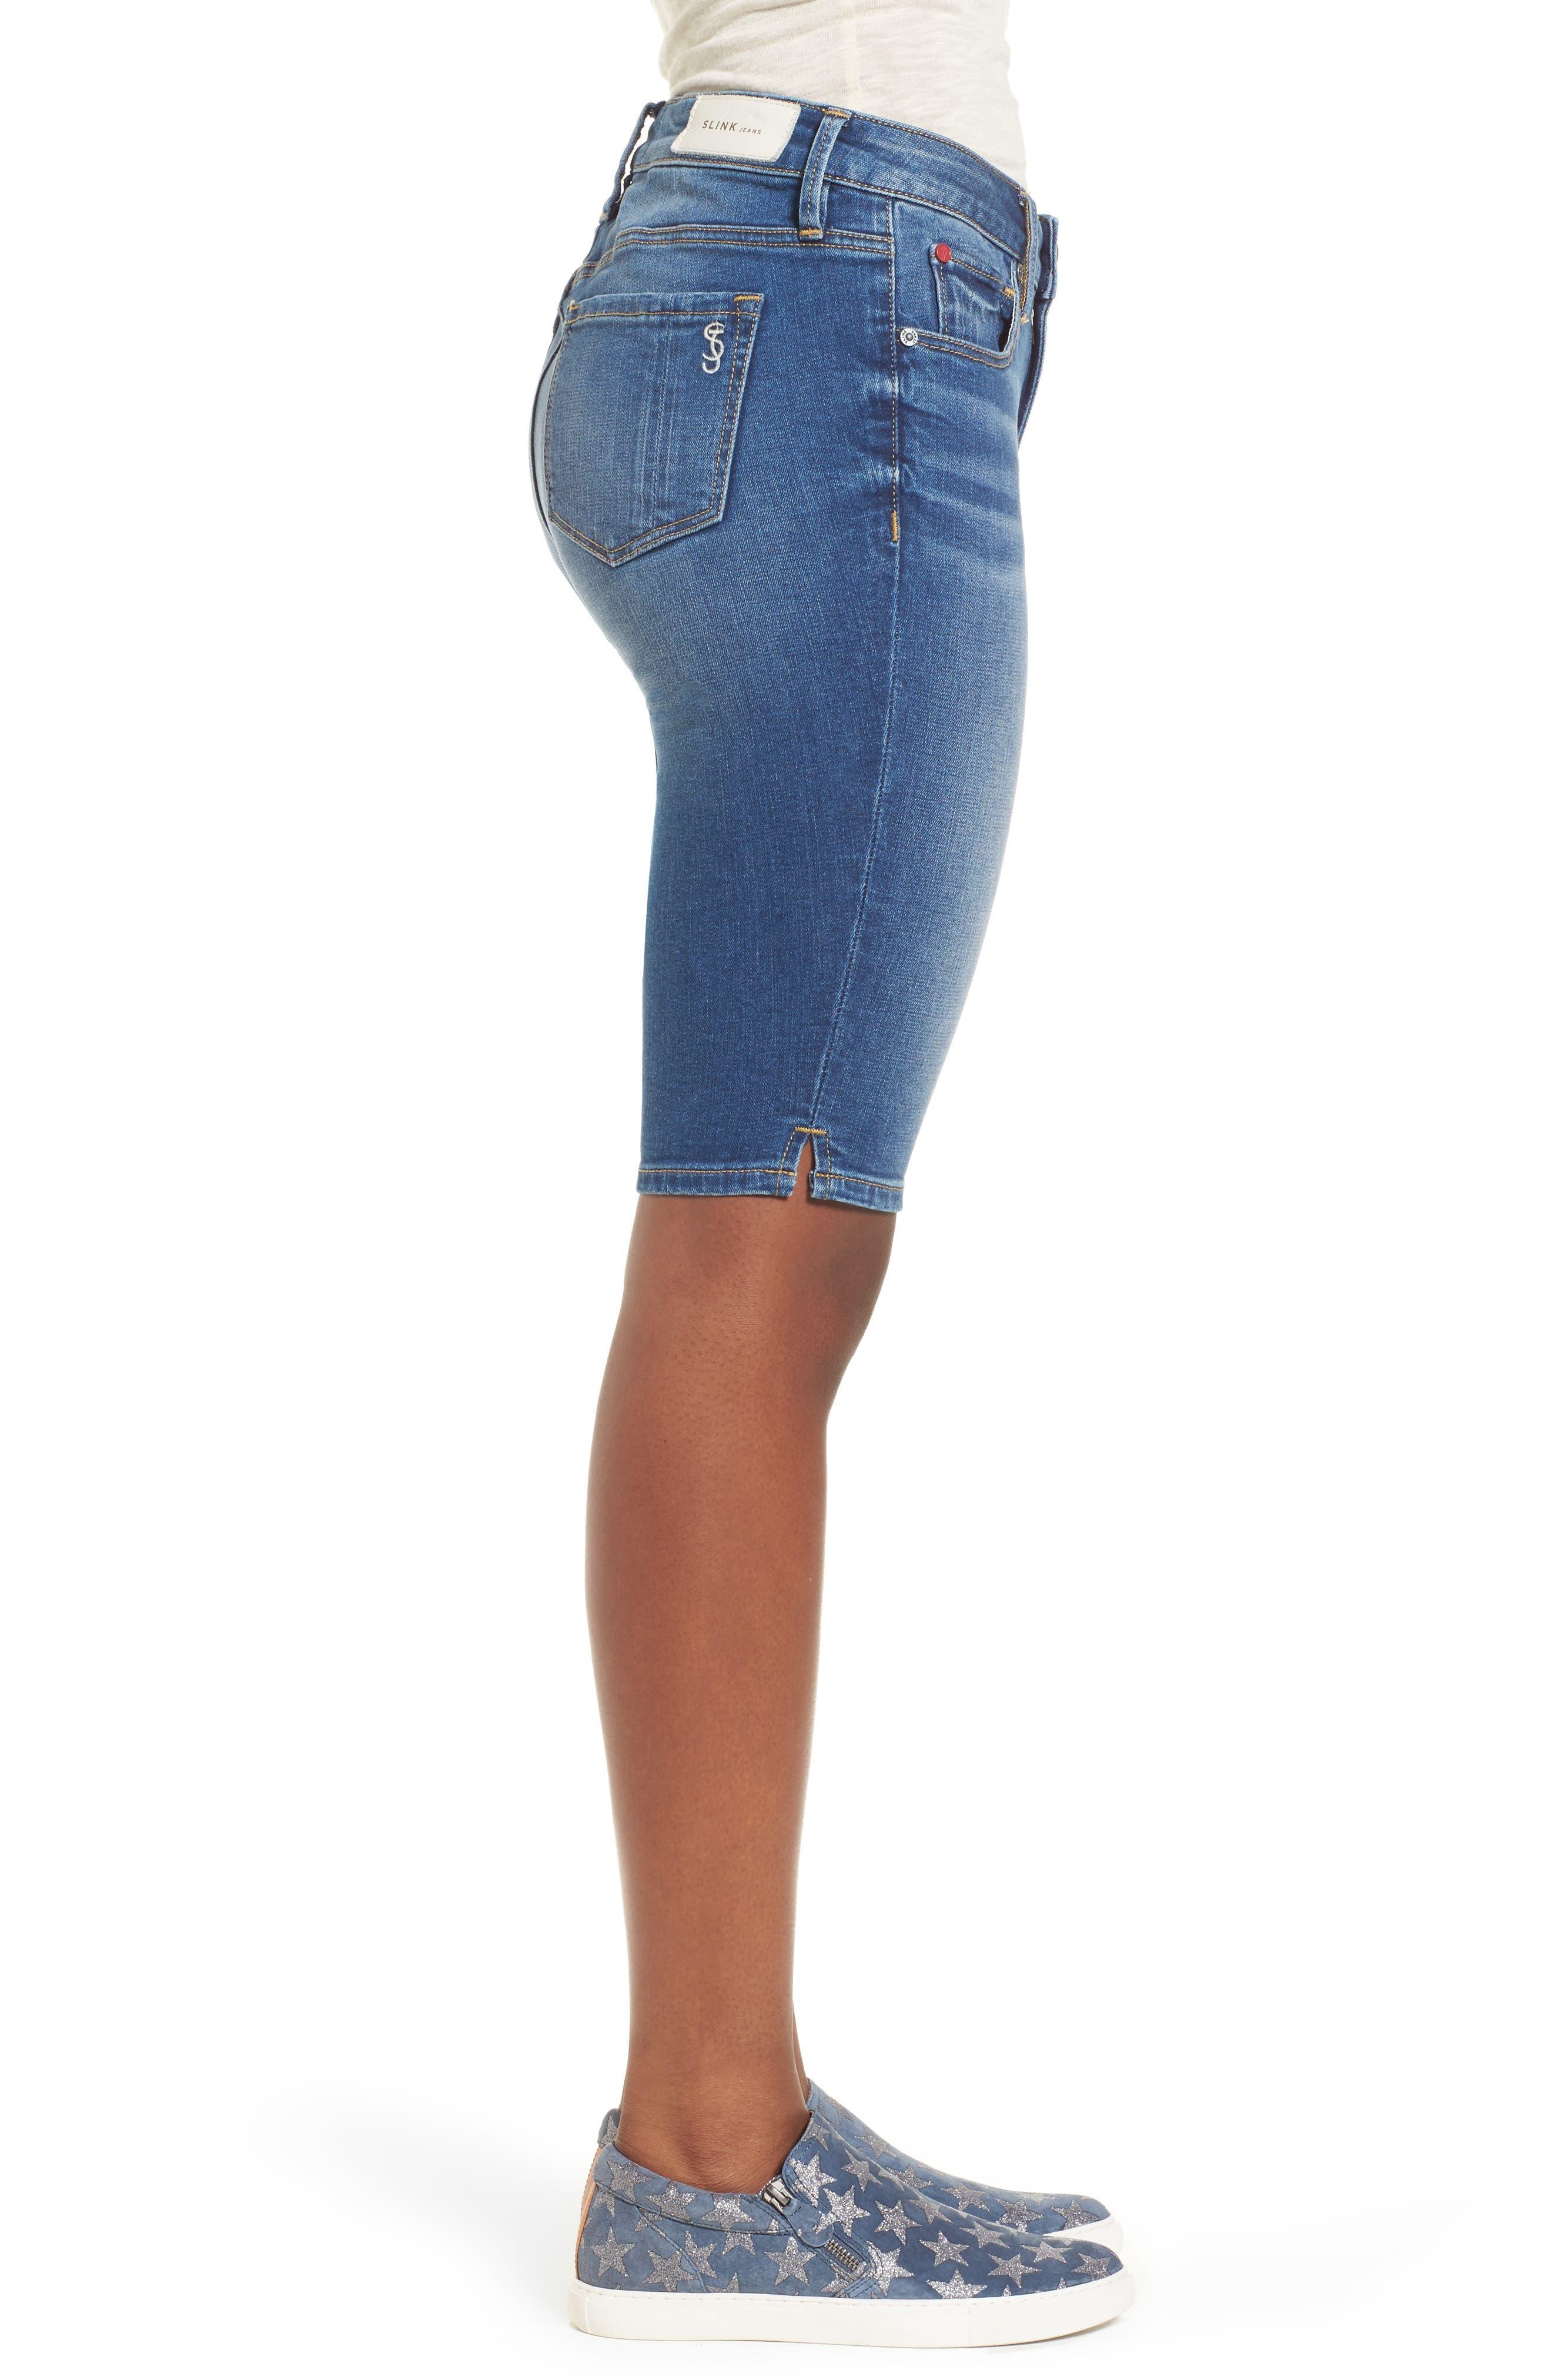 Bermuda Shorts,                             Alternate thumbnail 3, color,                             BIRDY